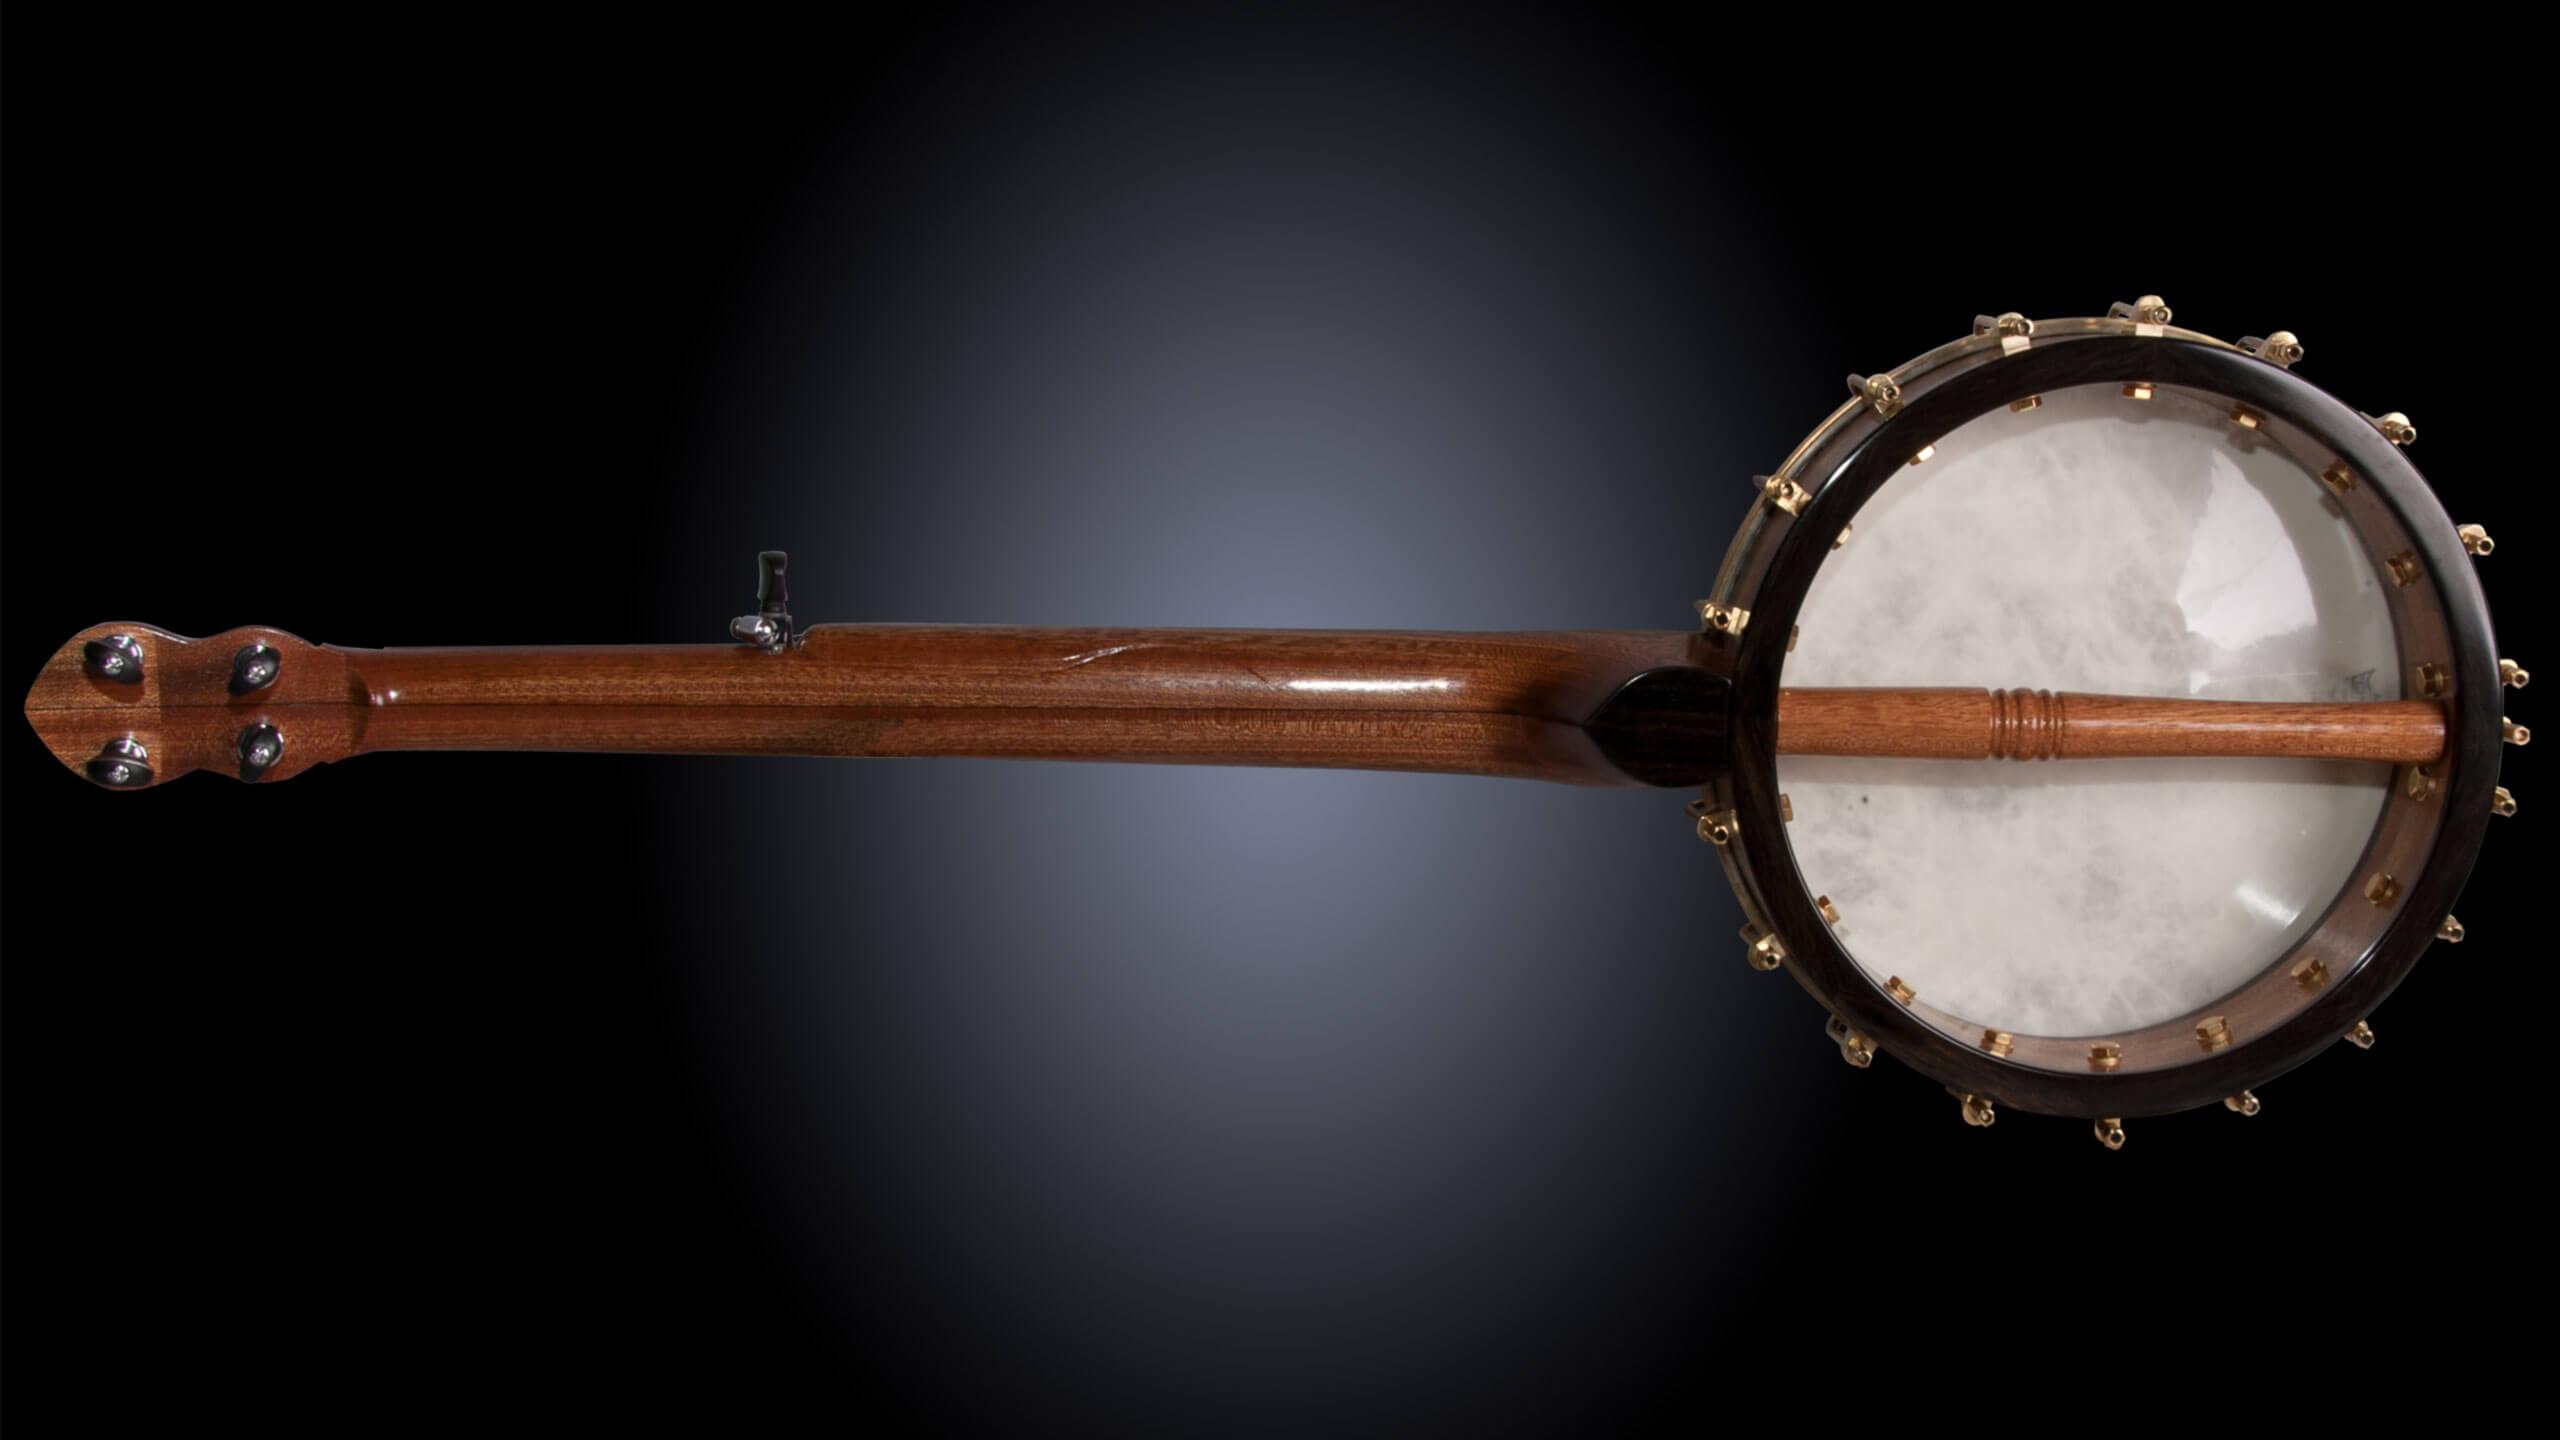 11-inch-rim-sapele-rosewood-banjo